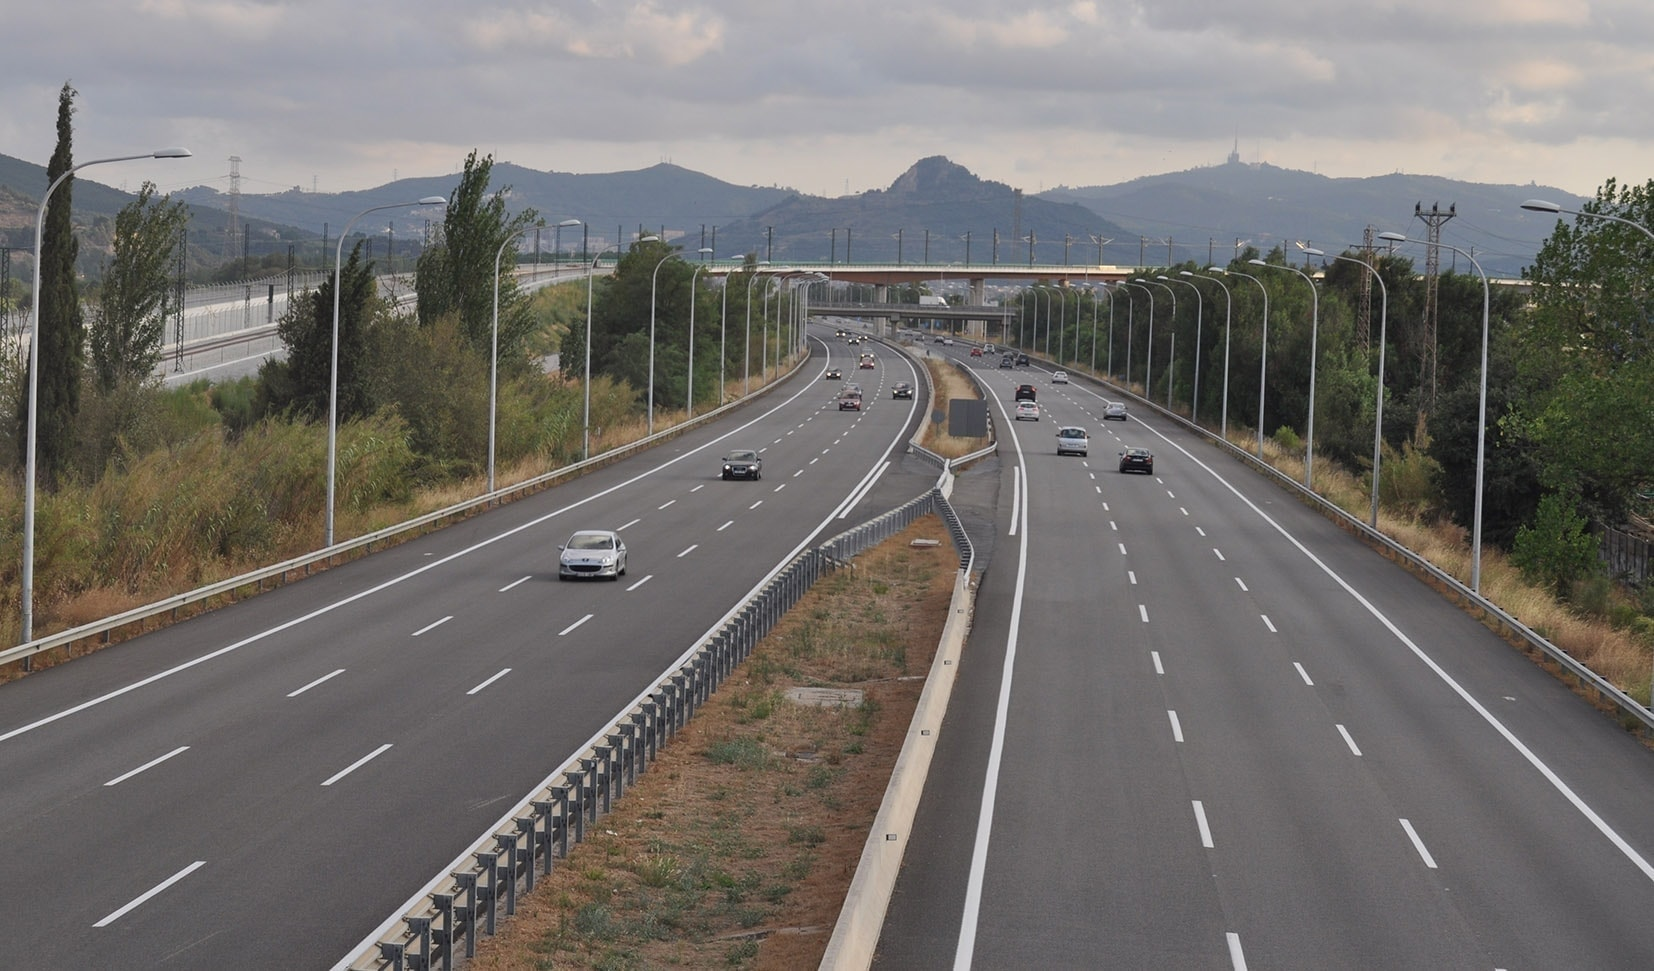 mediana-de-una-autopista